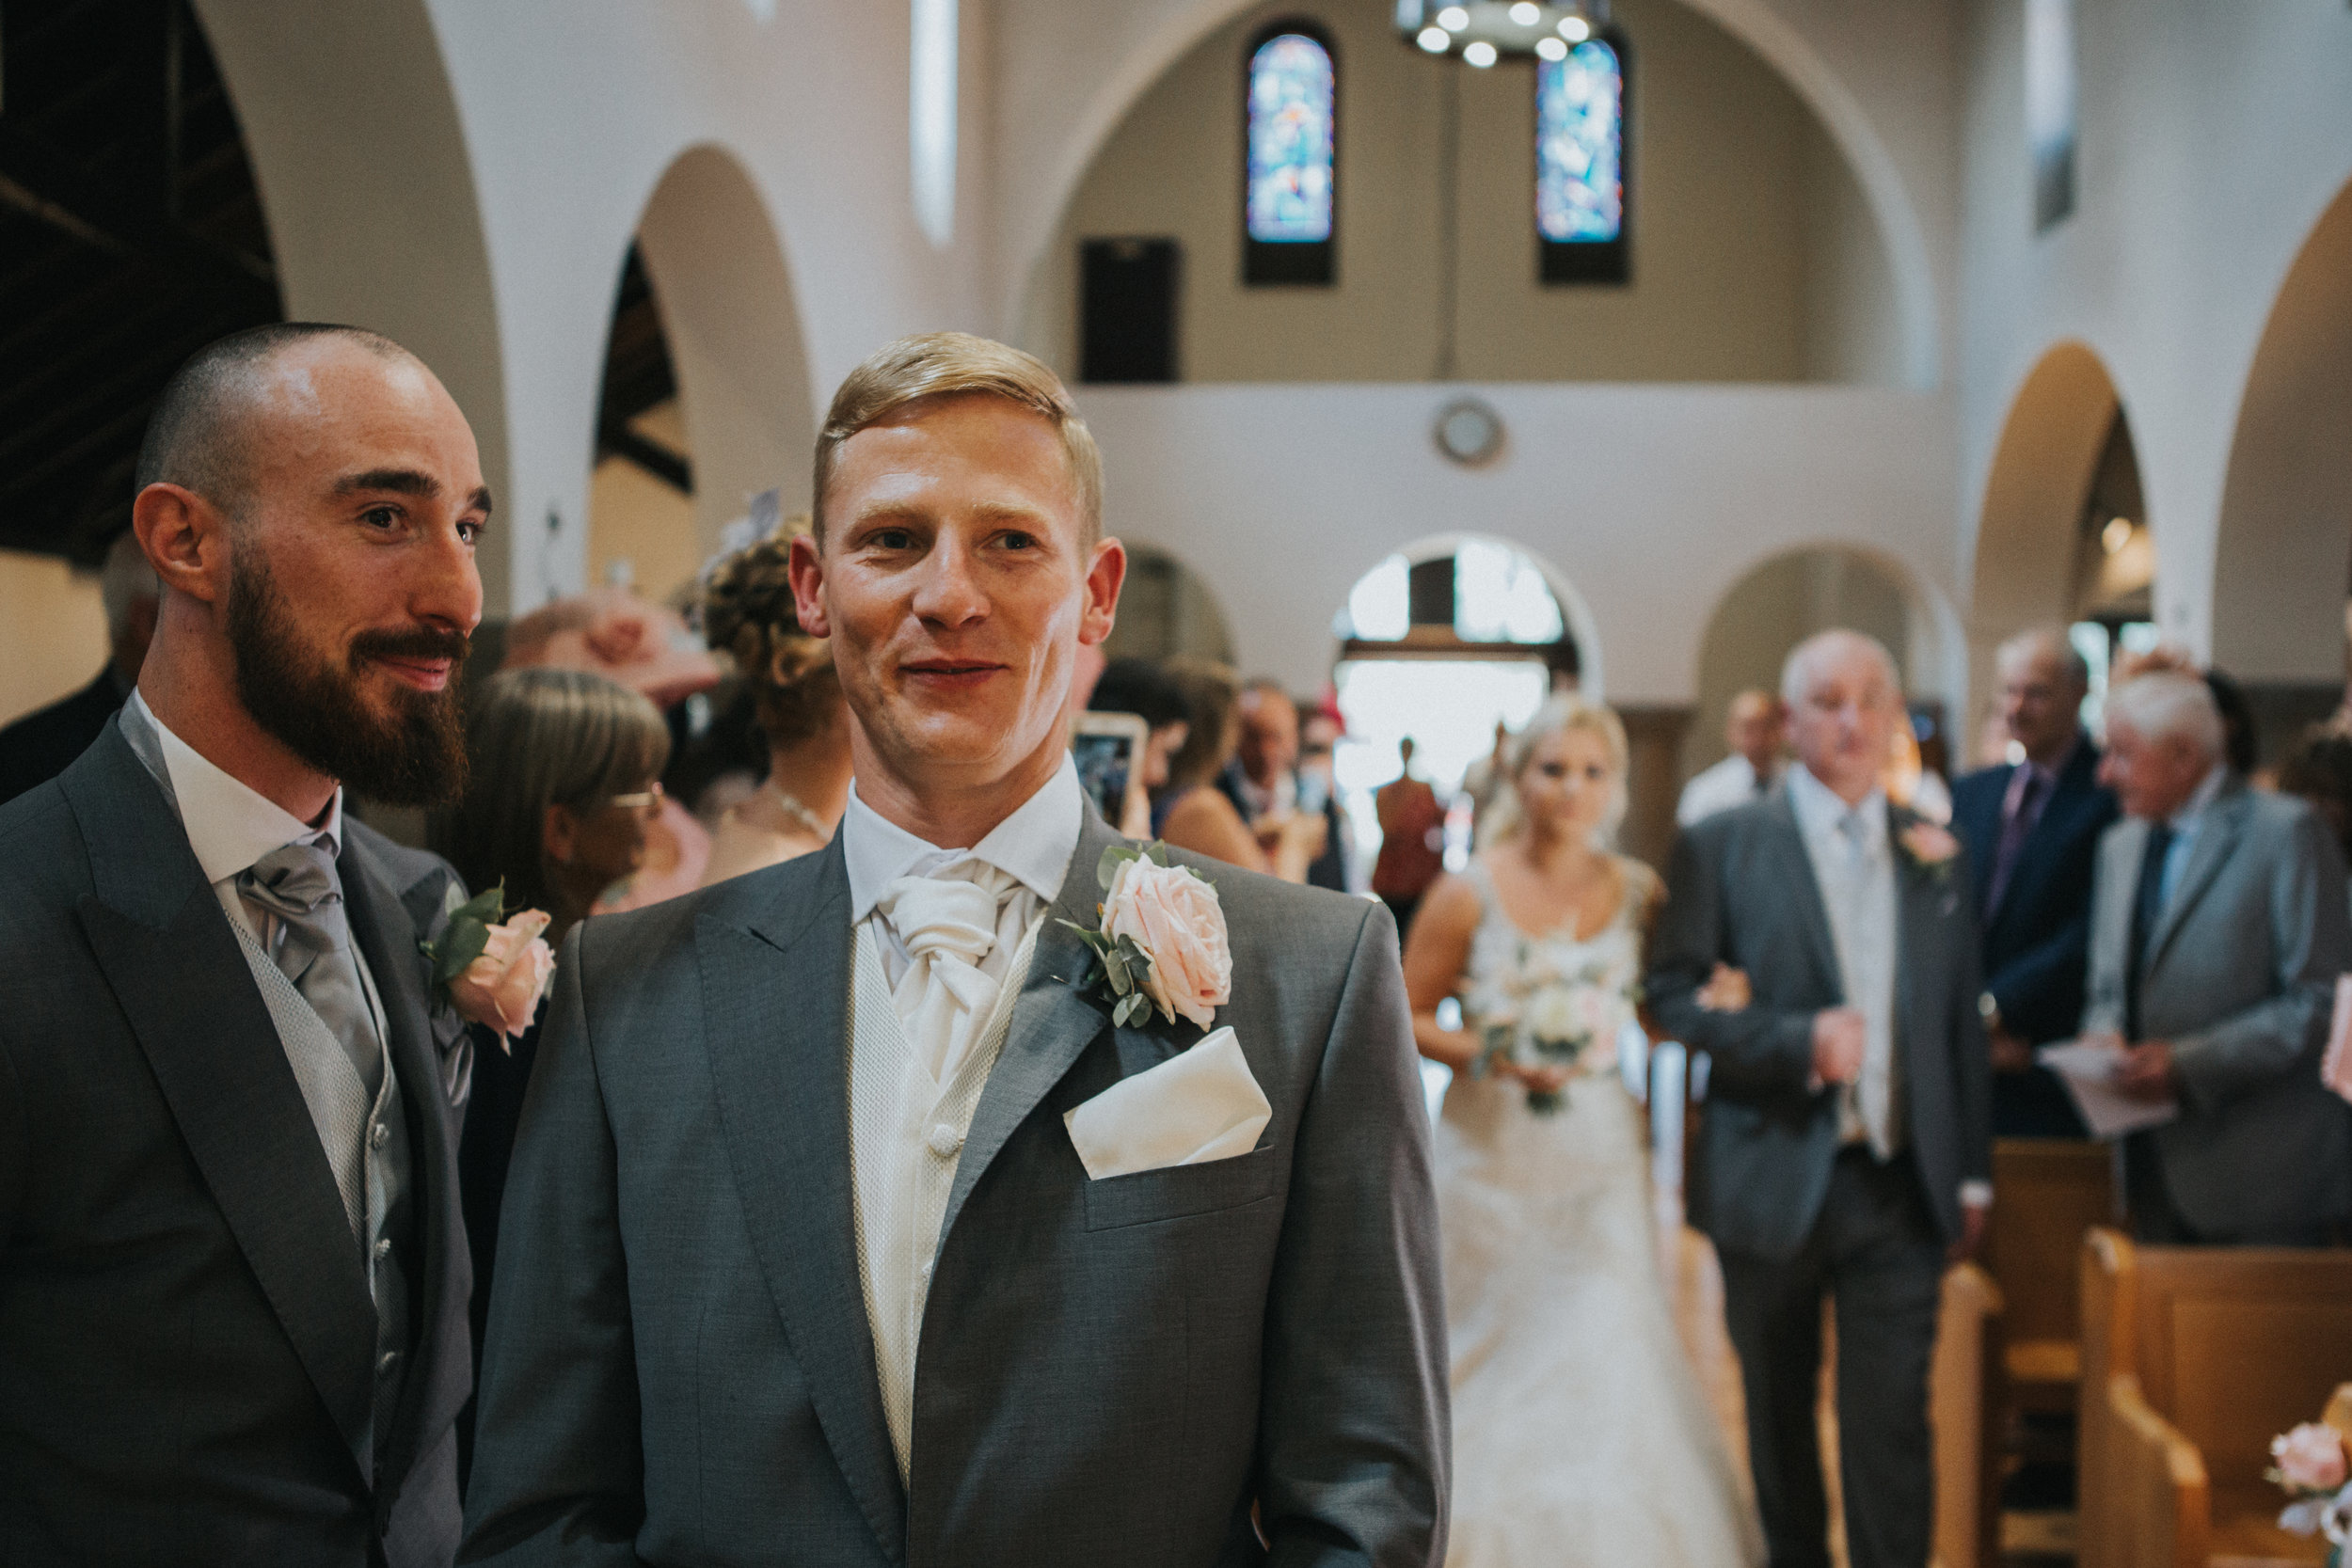 hitchin-hertfordshire-london-wedding-photography-st-bonaventures-catholic-church-ceremony-16